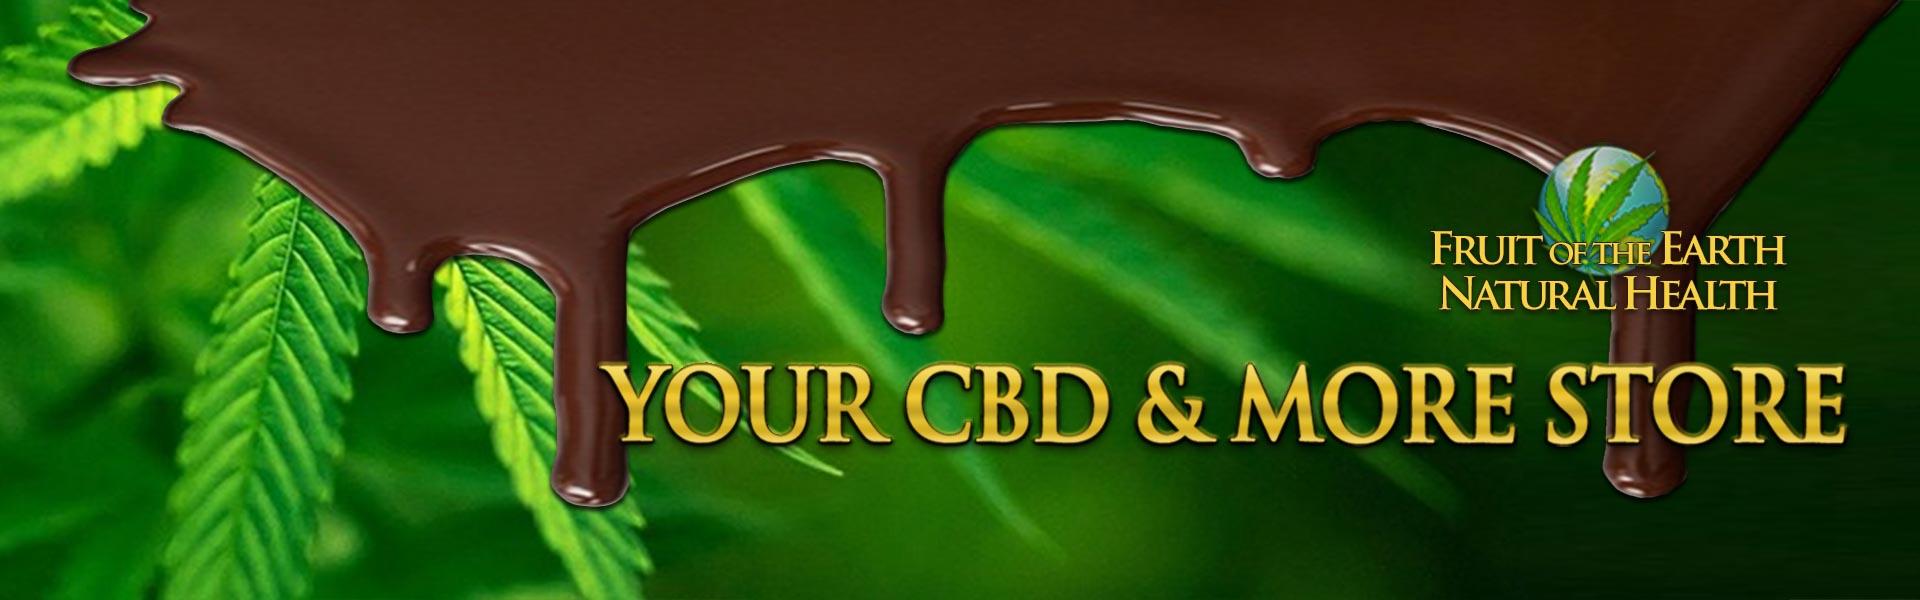 Extra Strength Sleep Tincture, 300 mg CBD